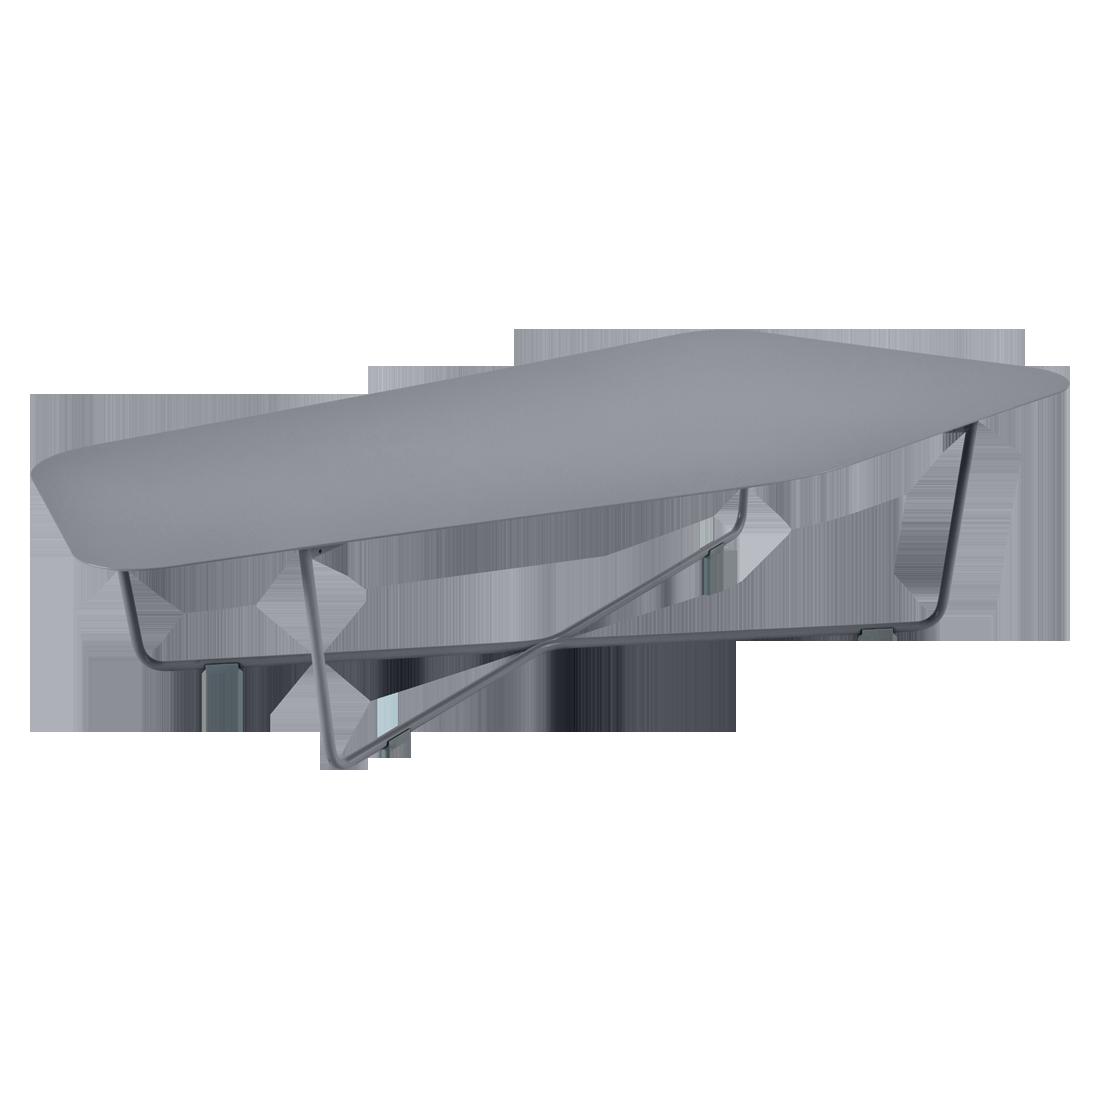 table basse design, table basse fermob, table basse ultrasofa, table basse metal, table basse de jardin, table basse noir